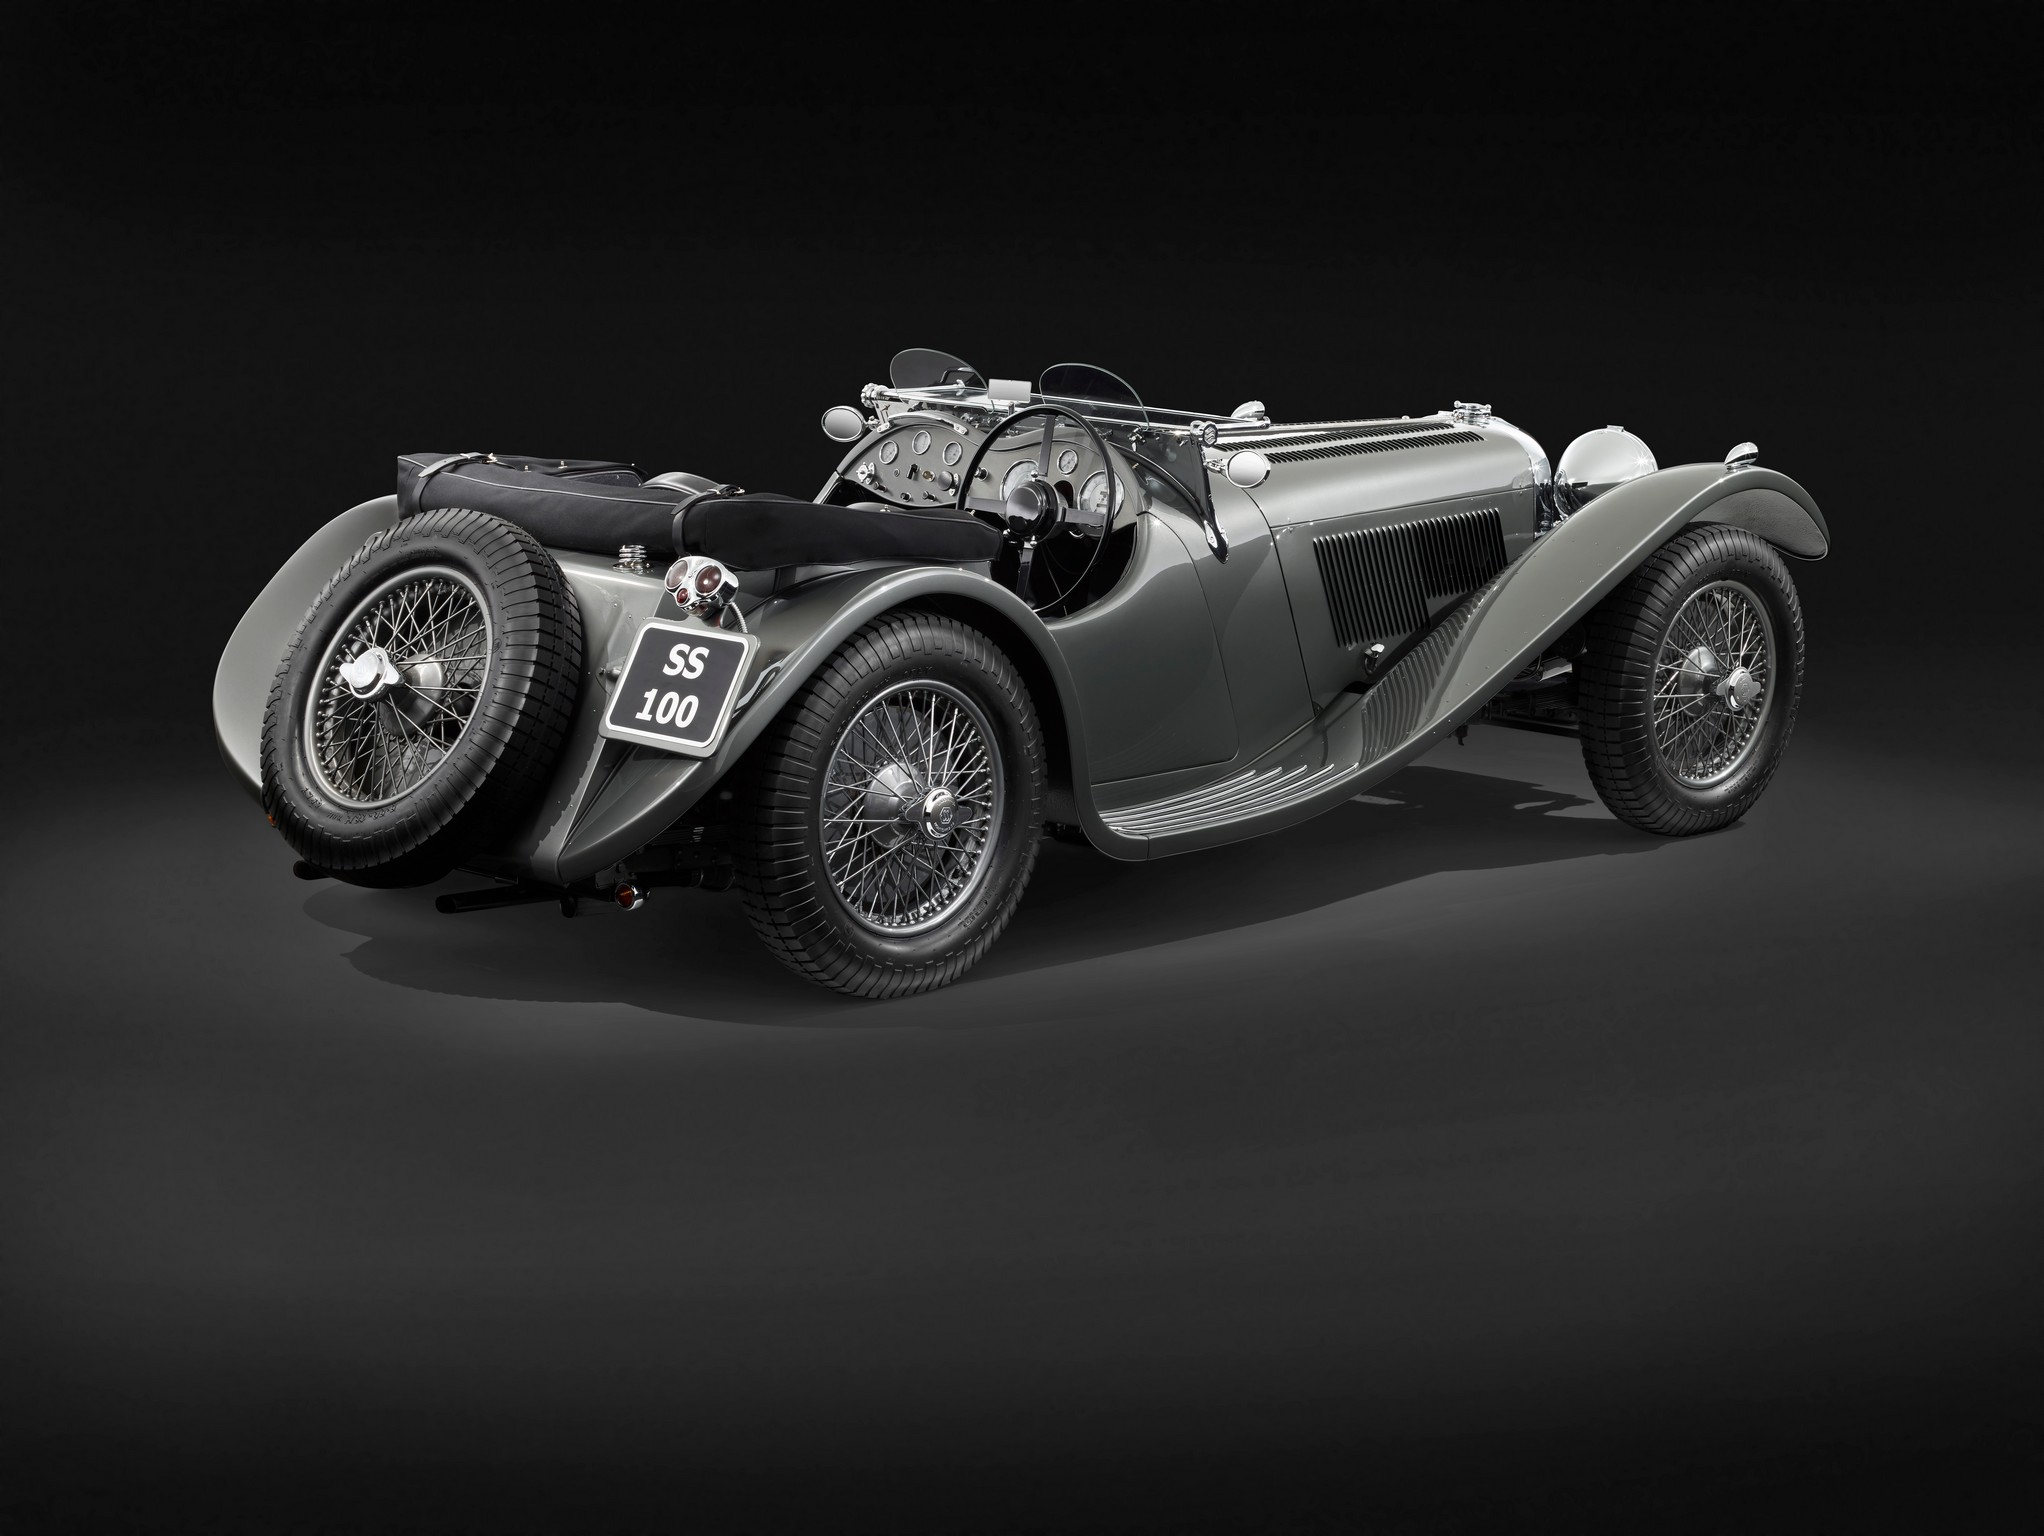 1938 Jaguar SS